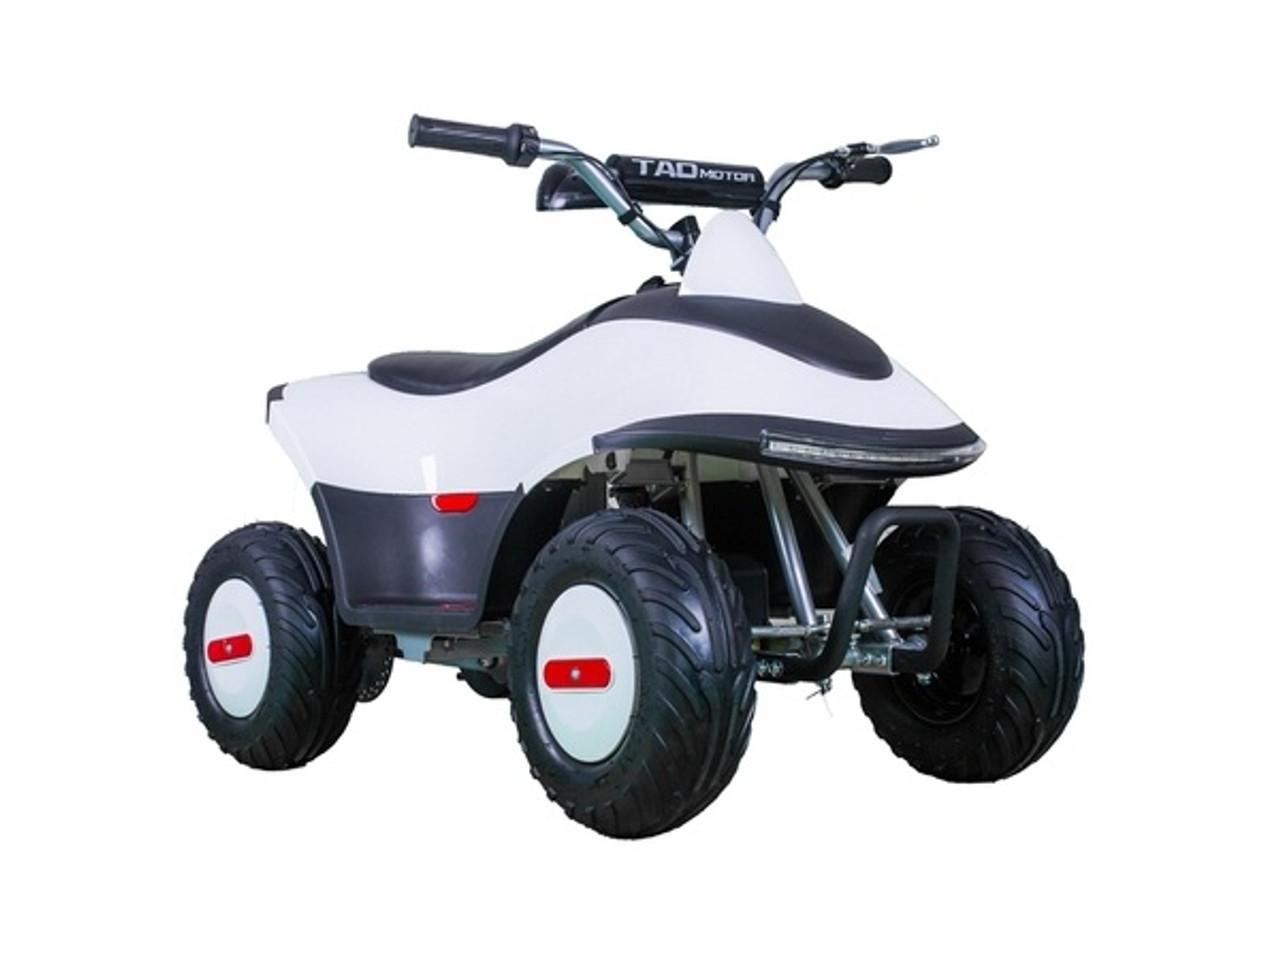 TaoTao ROVER350 350 Watt ATV, Brush Electric Motor Fully Assembled and Tested